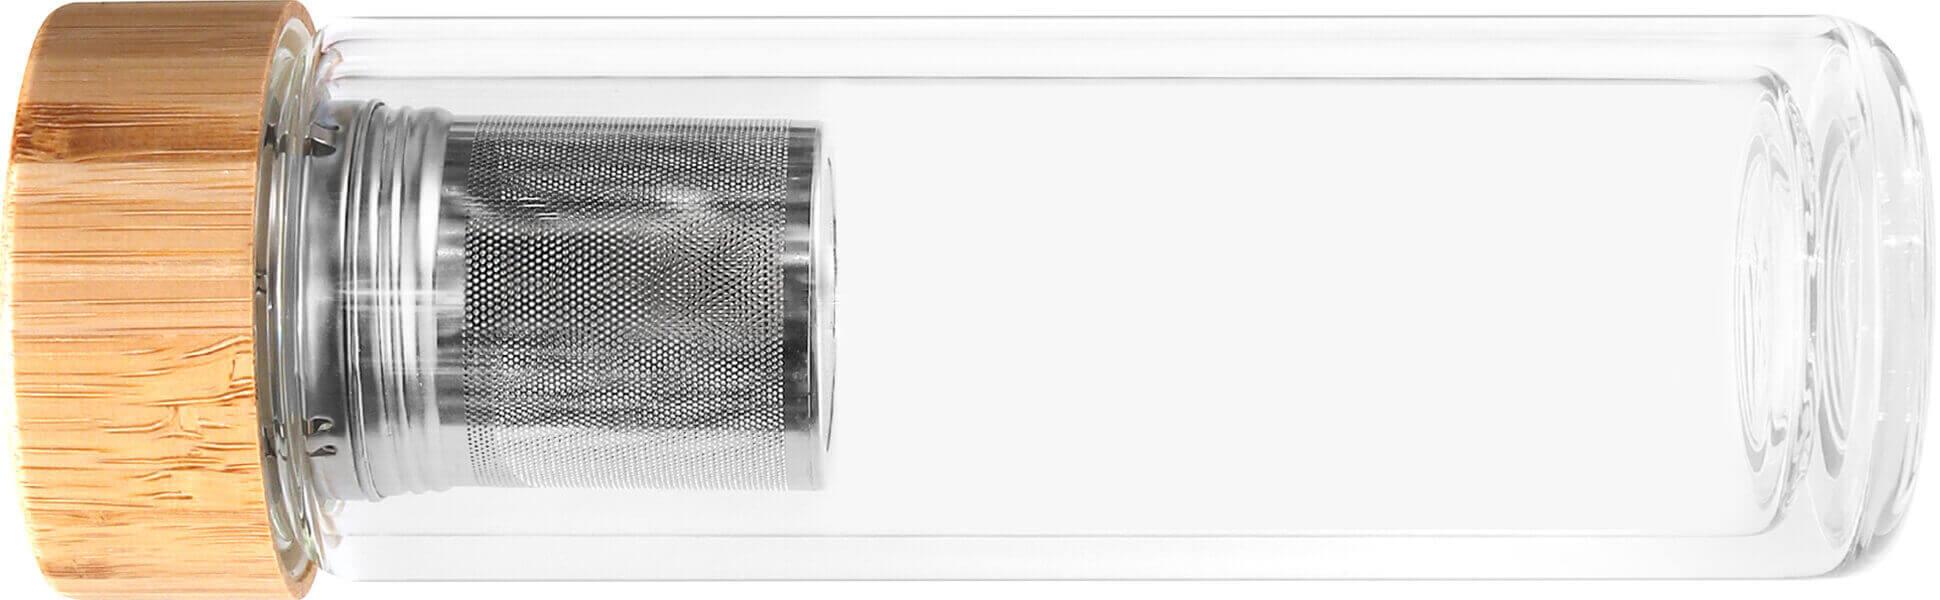 Decantadores de vidrio